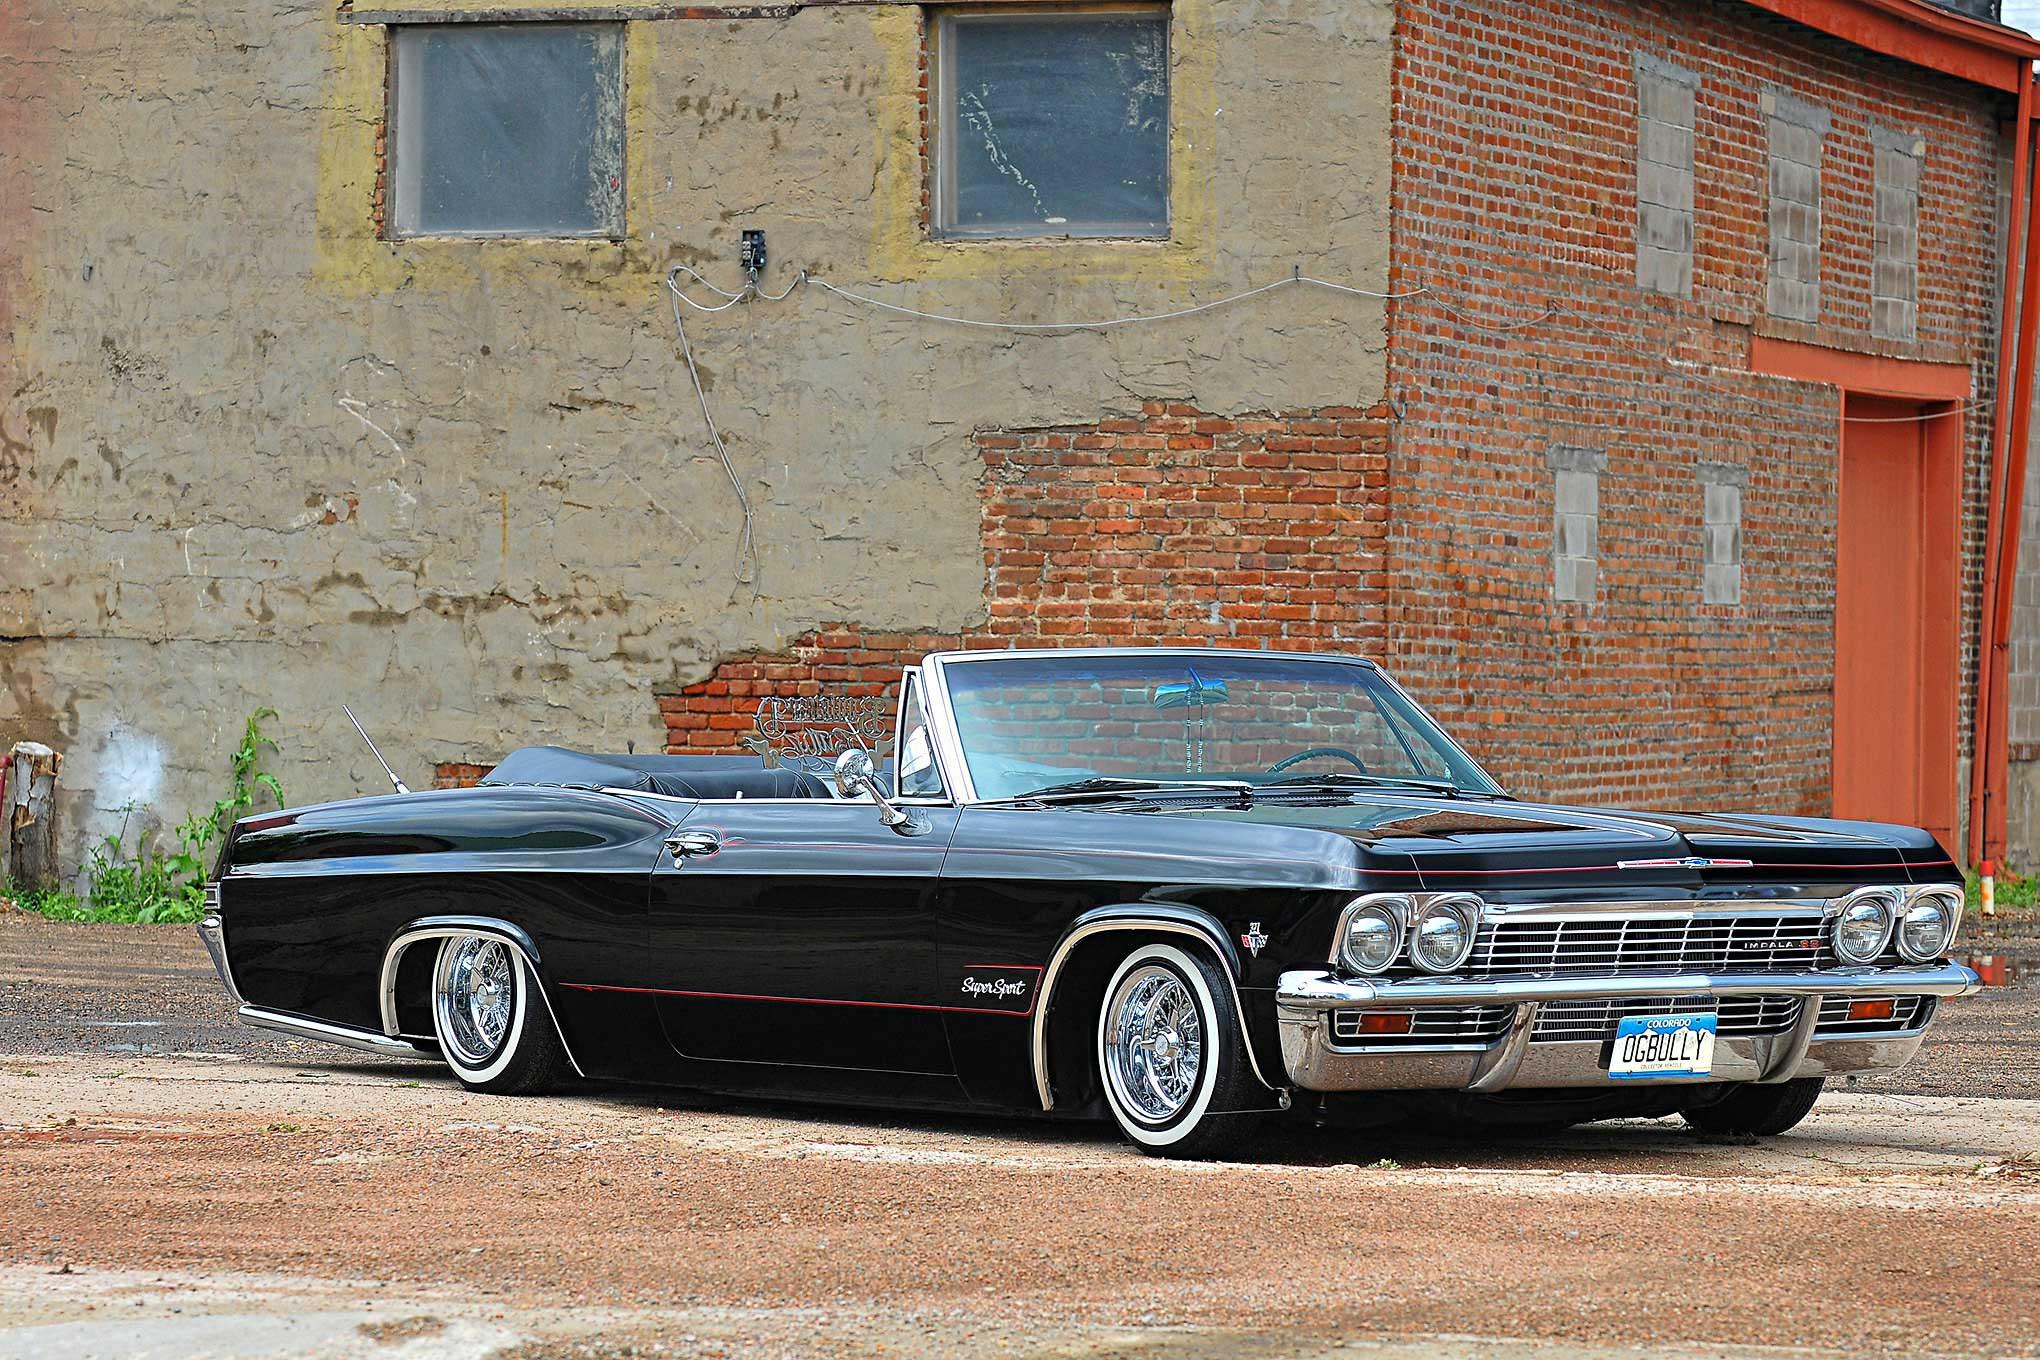 1965 chevrolet impala convertible lowrider rh lowrider com 1969 Impala 1968 Impala